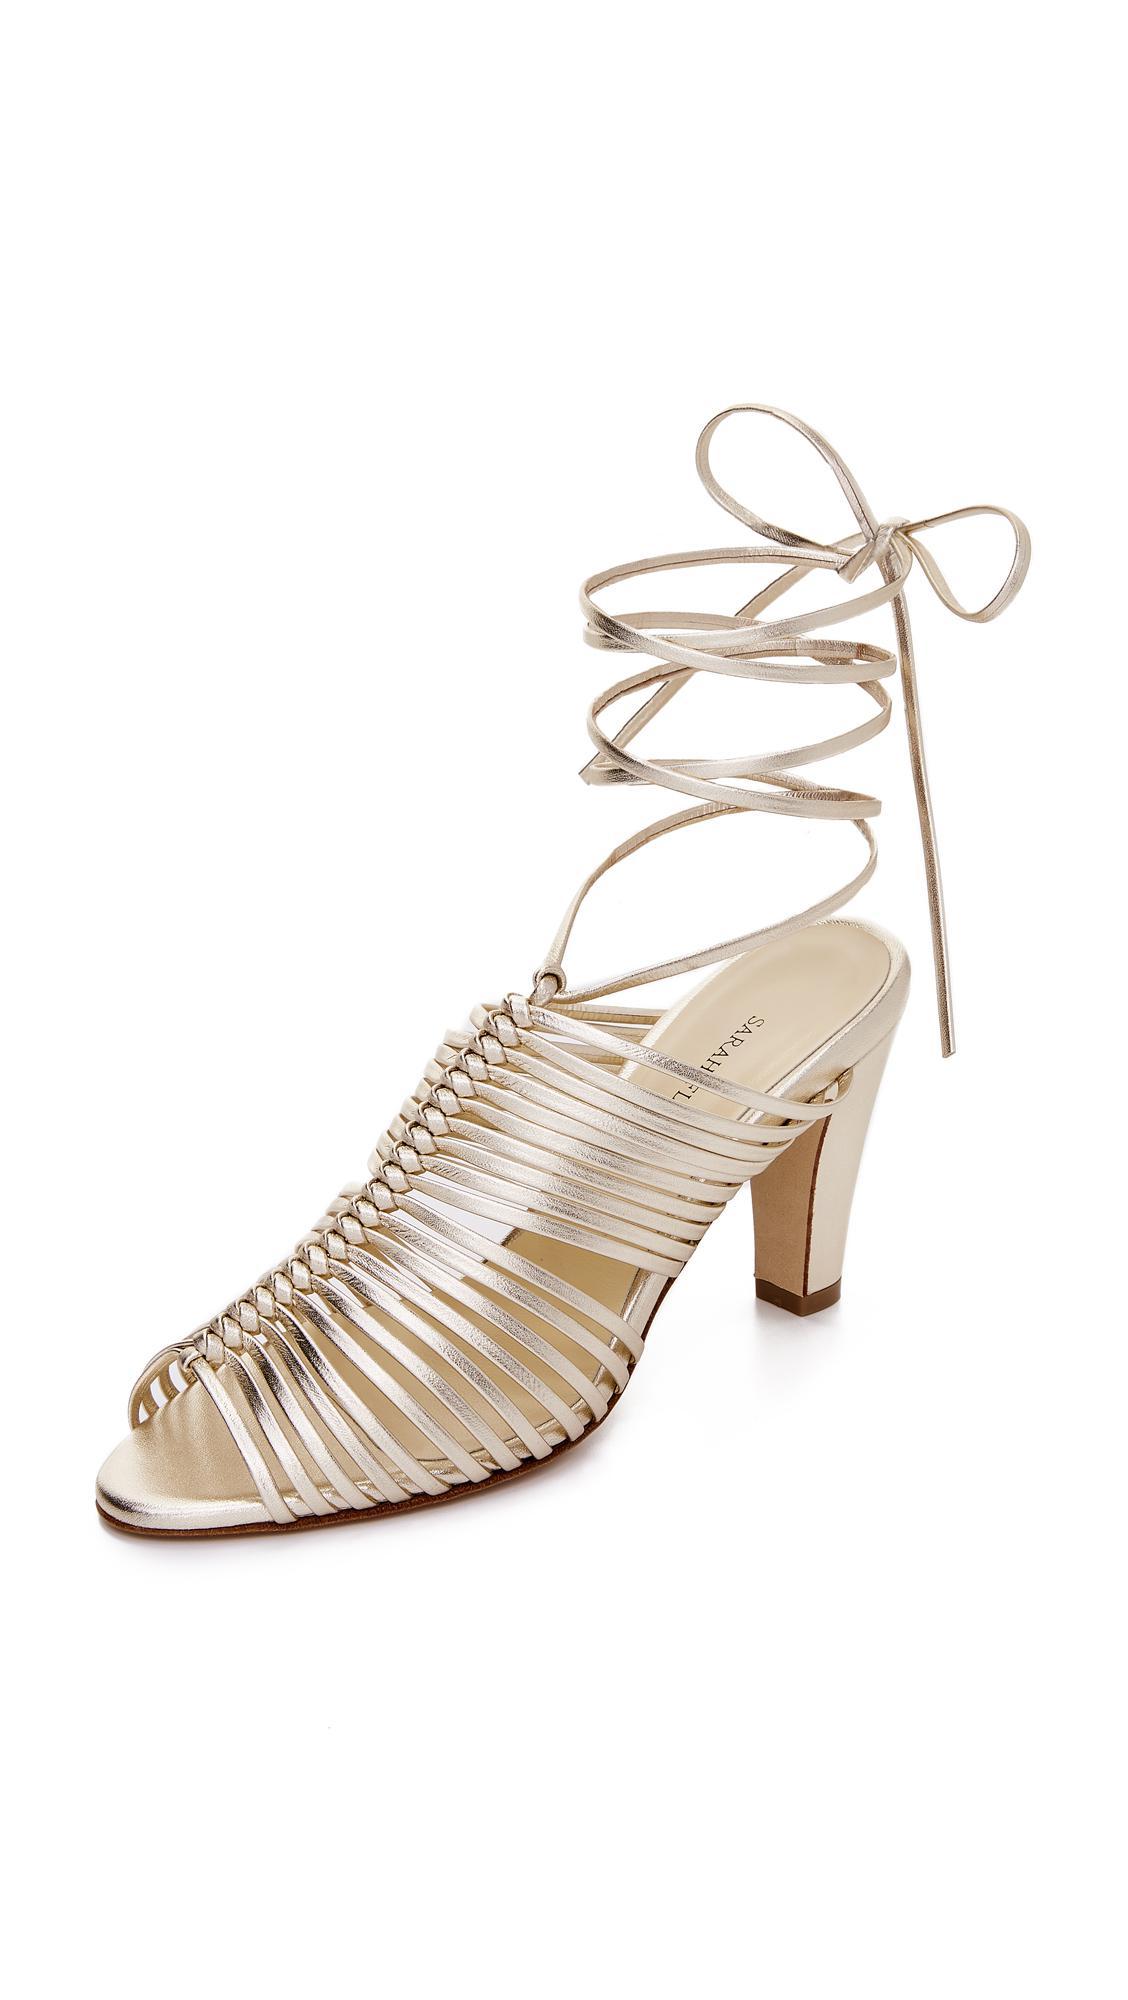 Womens Ivy Leather Ankle-Tie Sandals Sarah Flint Oc7dVUjHy